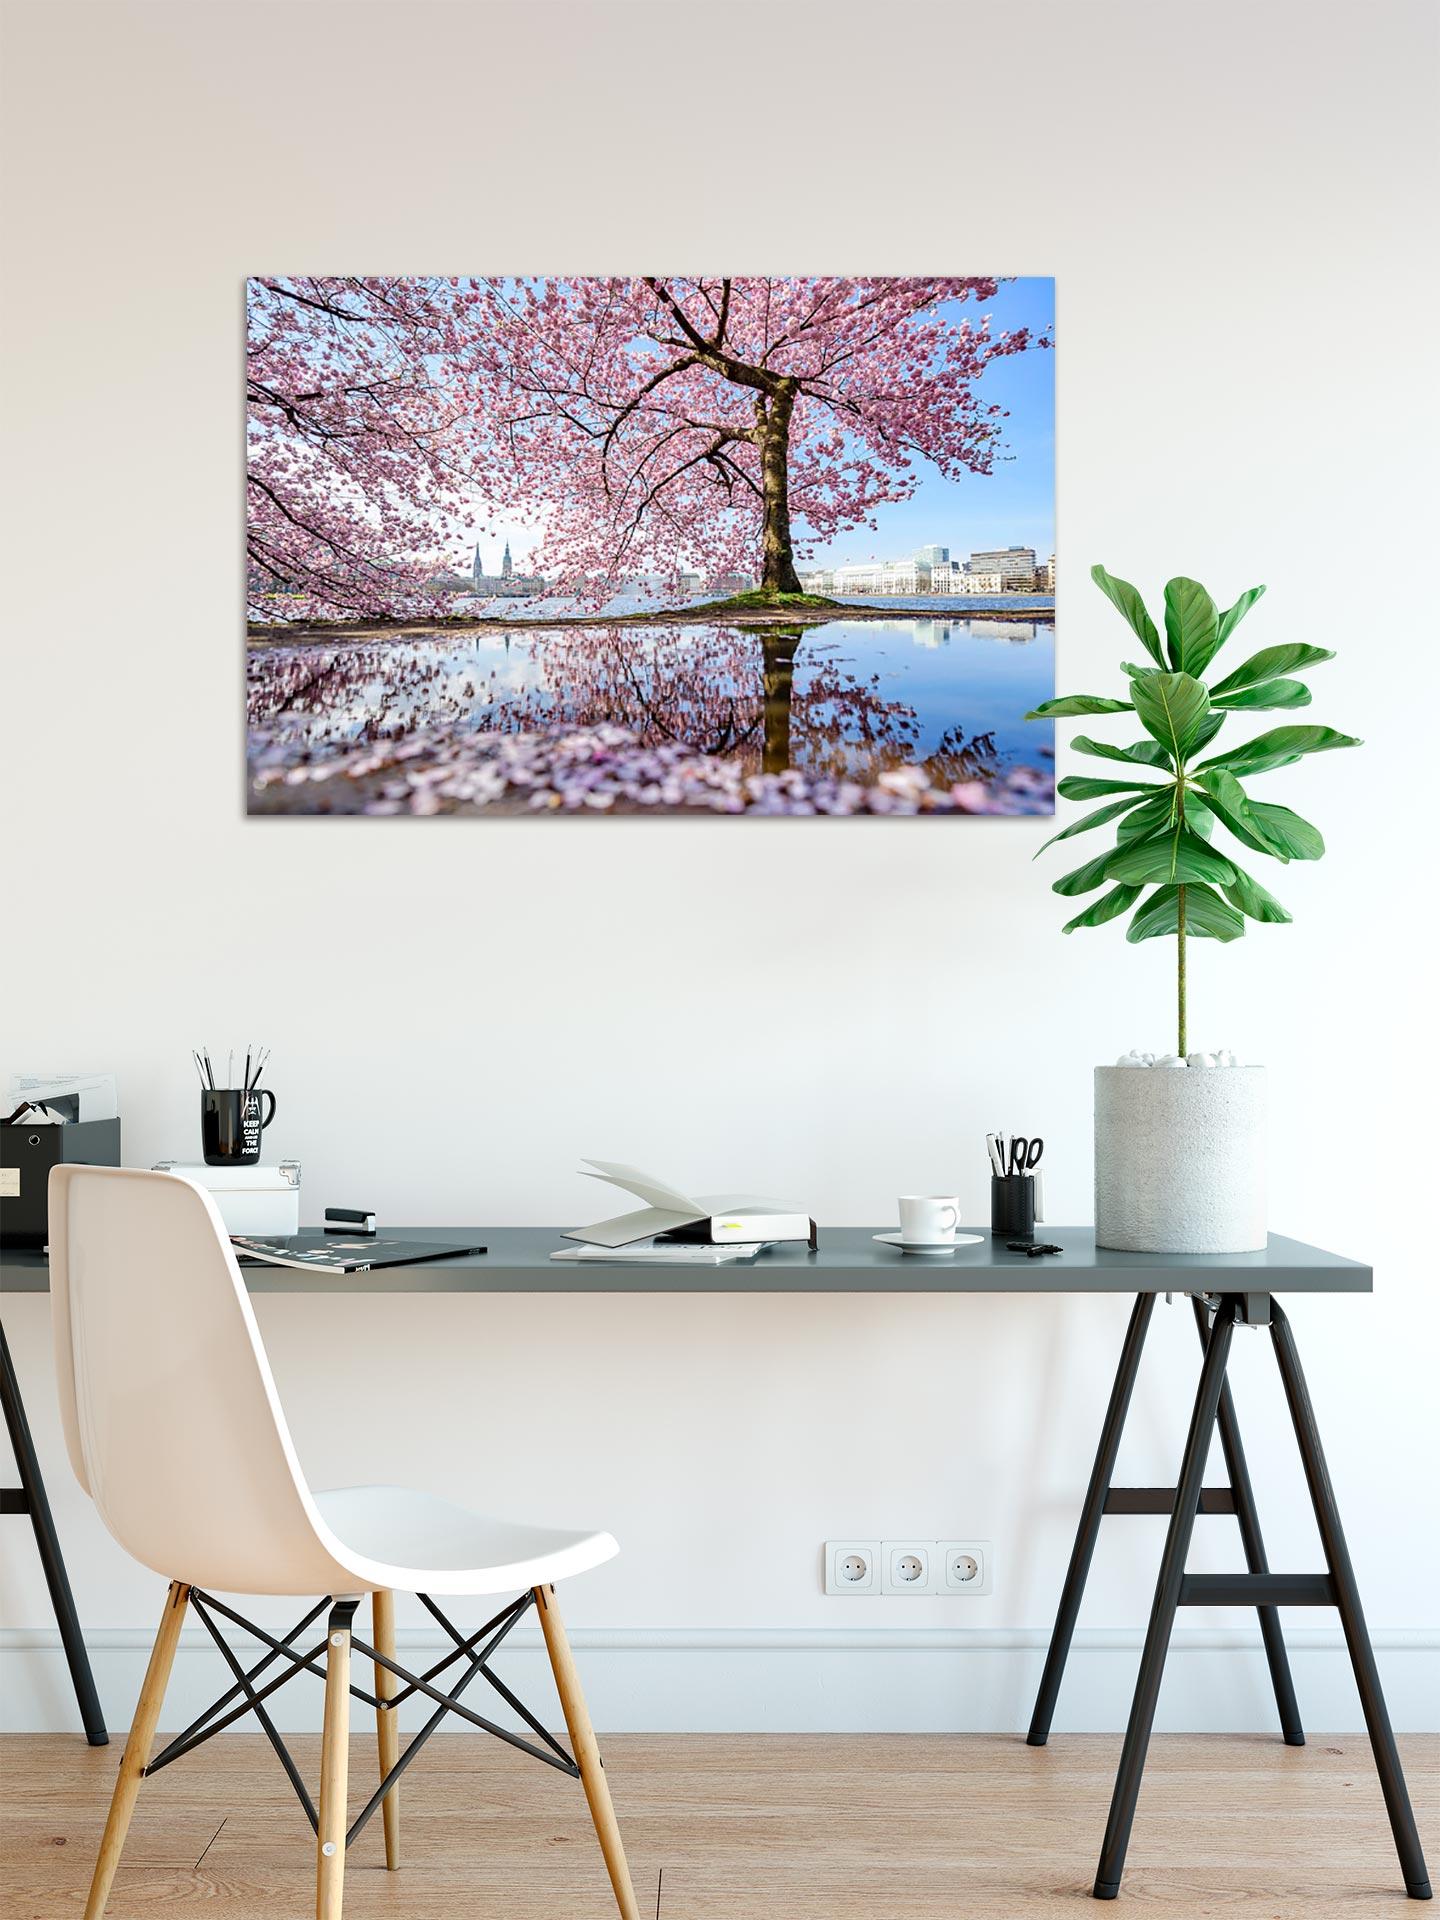 NL069-alster-fruehling-kirschbluete-hamburg-wandbild-auf-leinwand-acrylglas-aludibond-arbeitszimmer